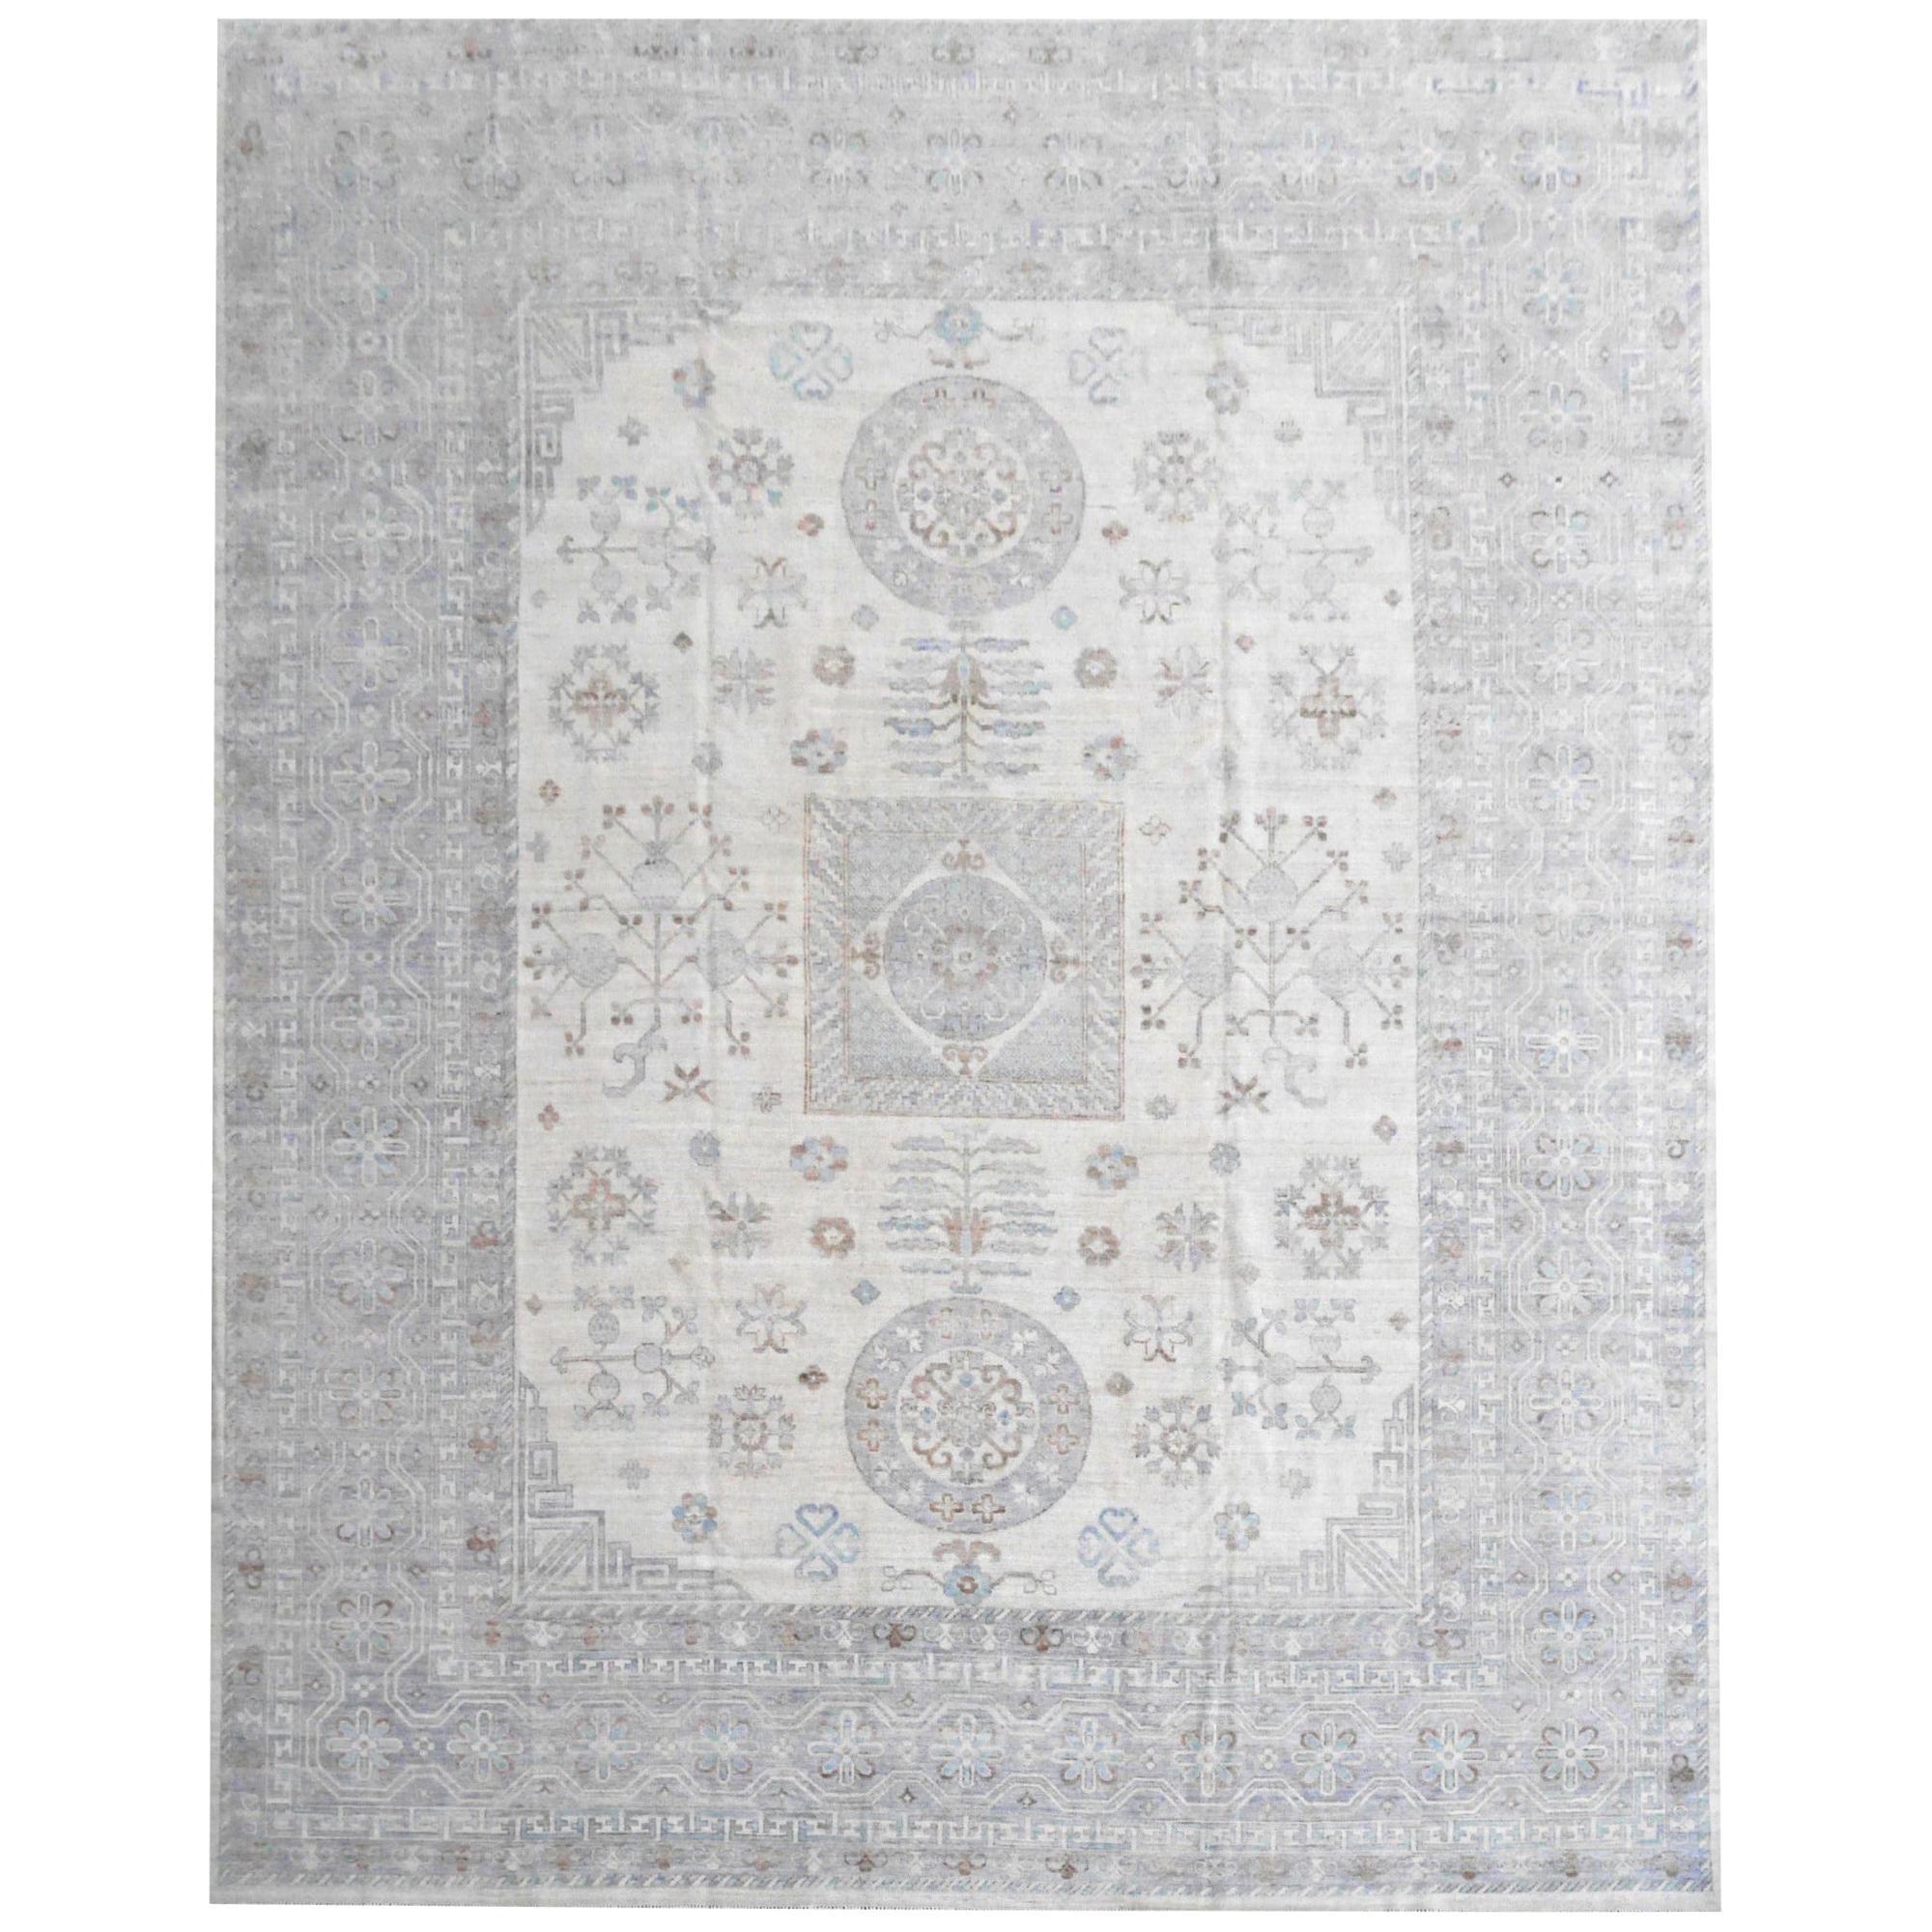 Large Samarkand Khotan Style Rug Hand Knotted Contemporary White Gray Oversized